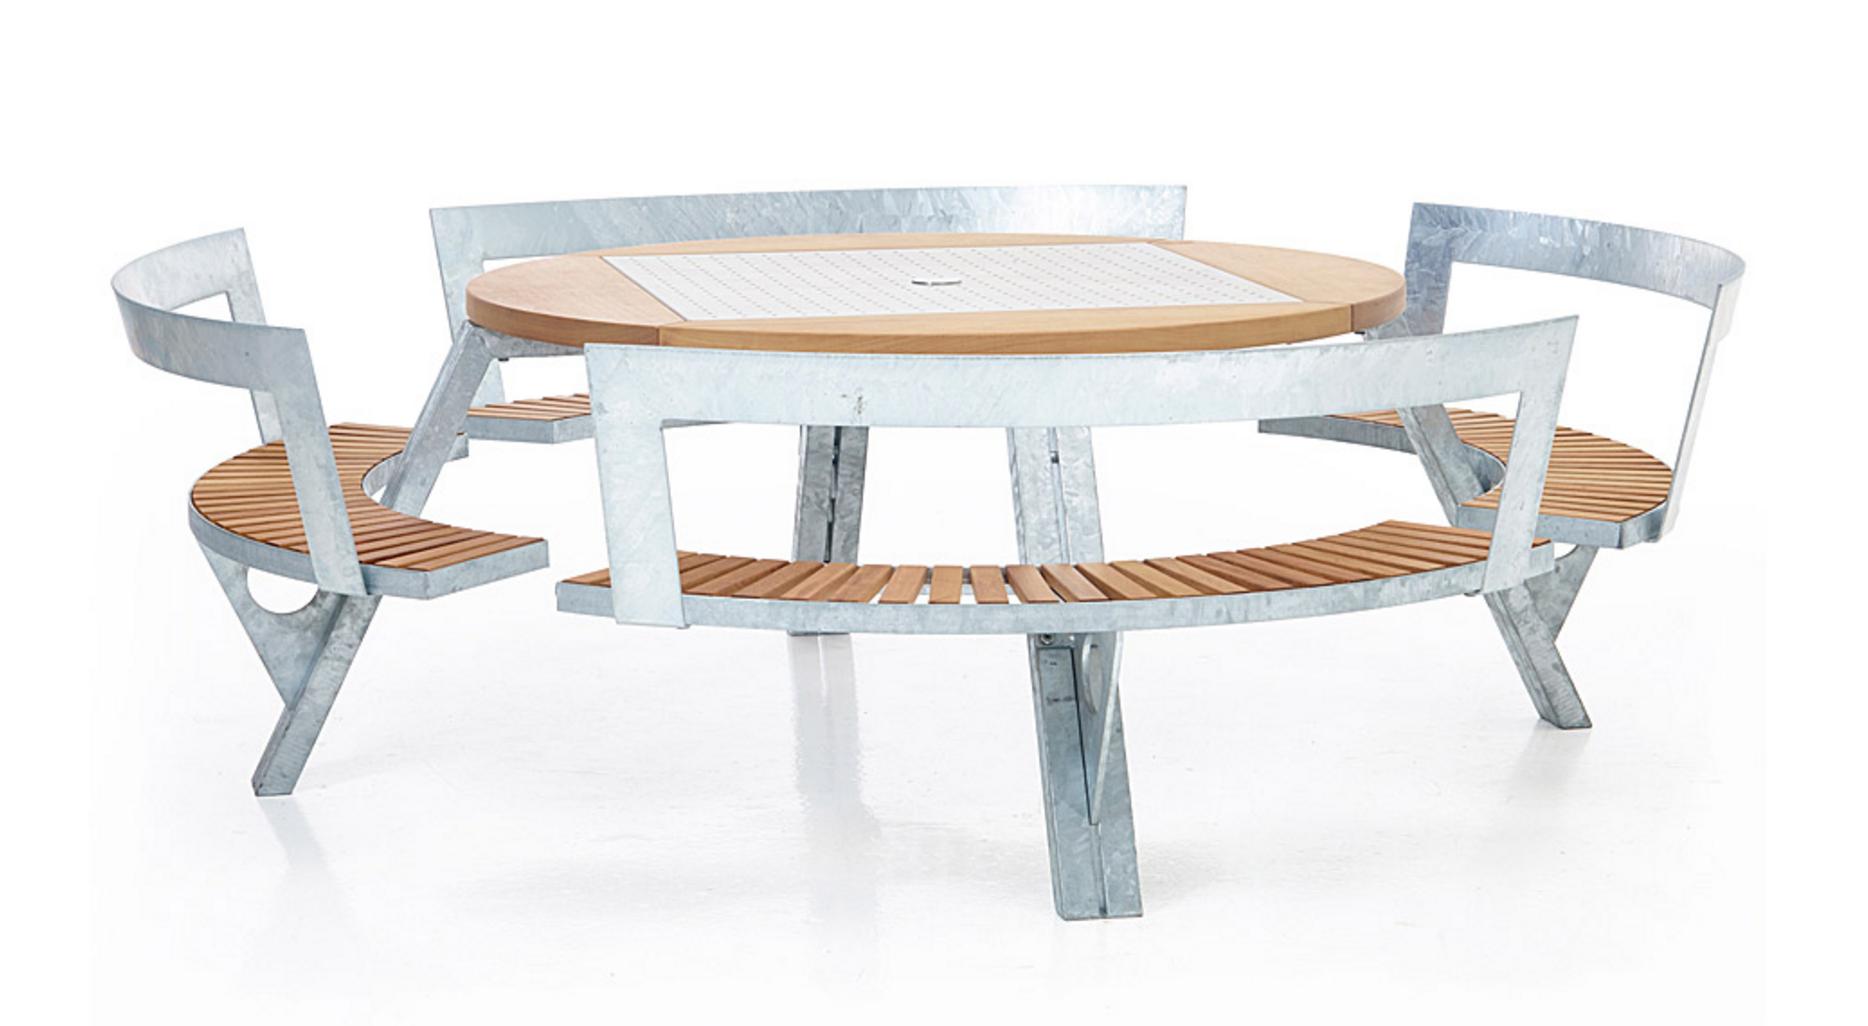 Spaceist Gargantua picnic table